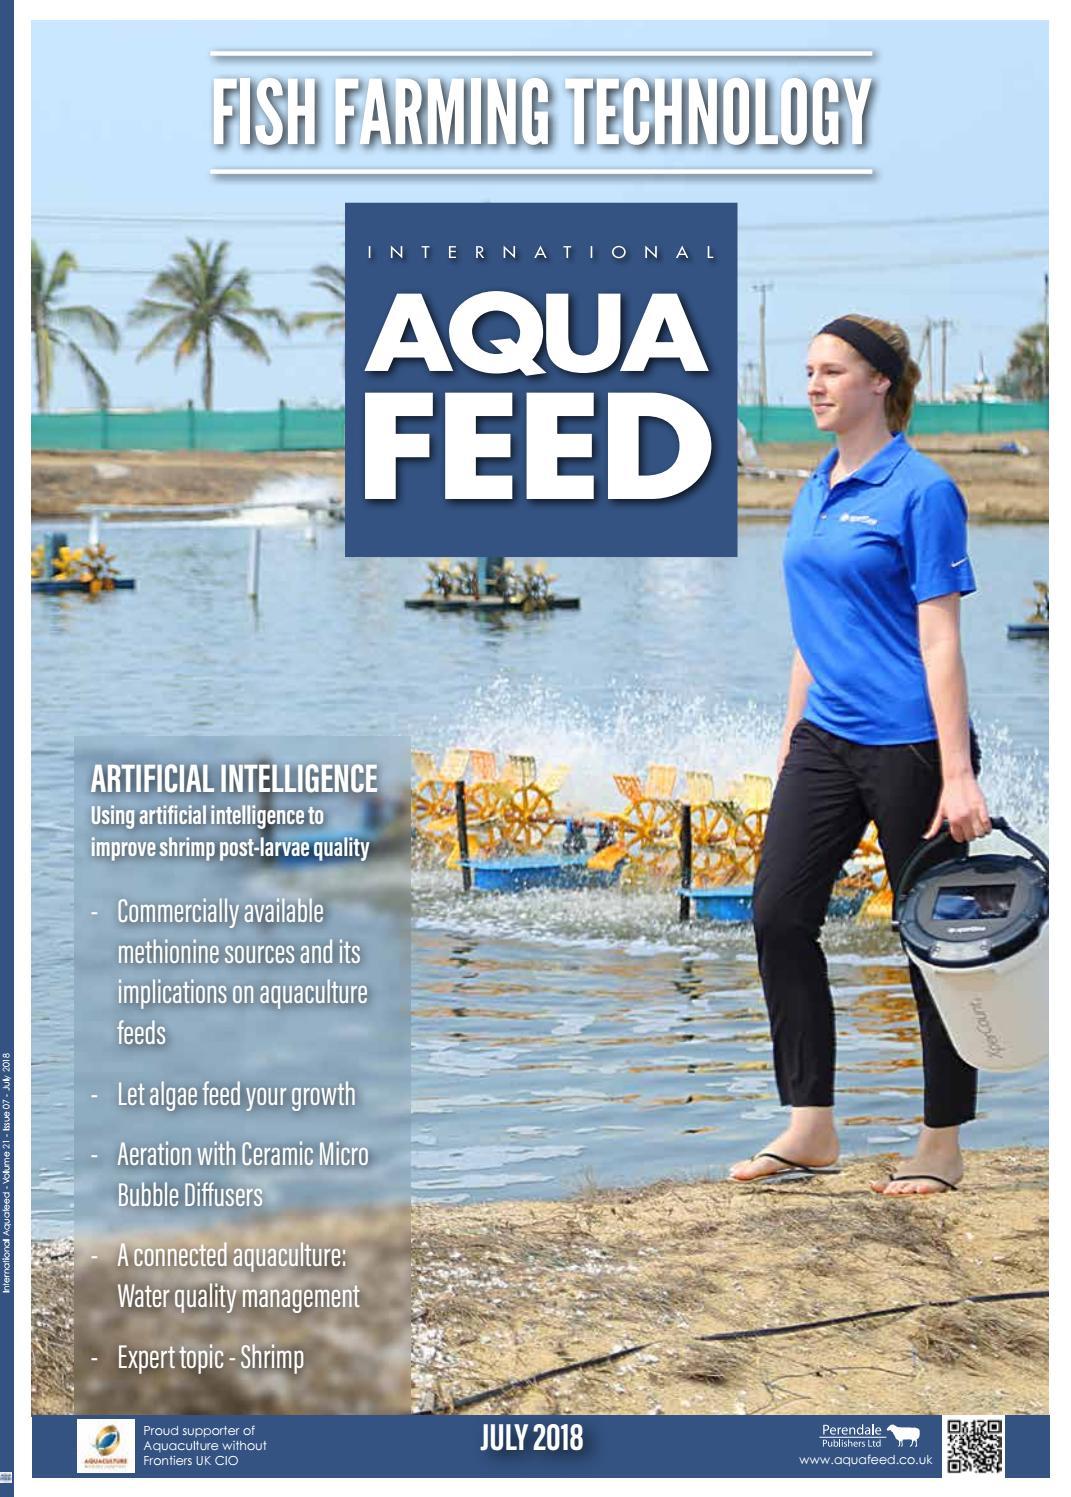 JUL 2018 - International Aquafeed magazine by Perendale